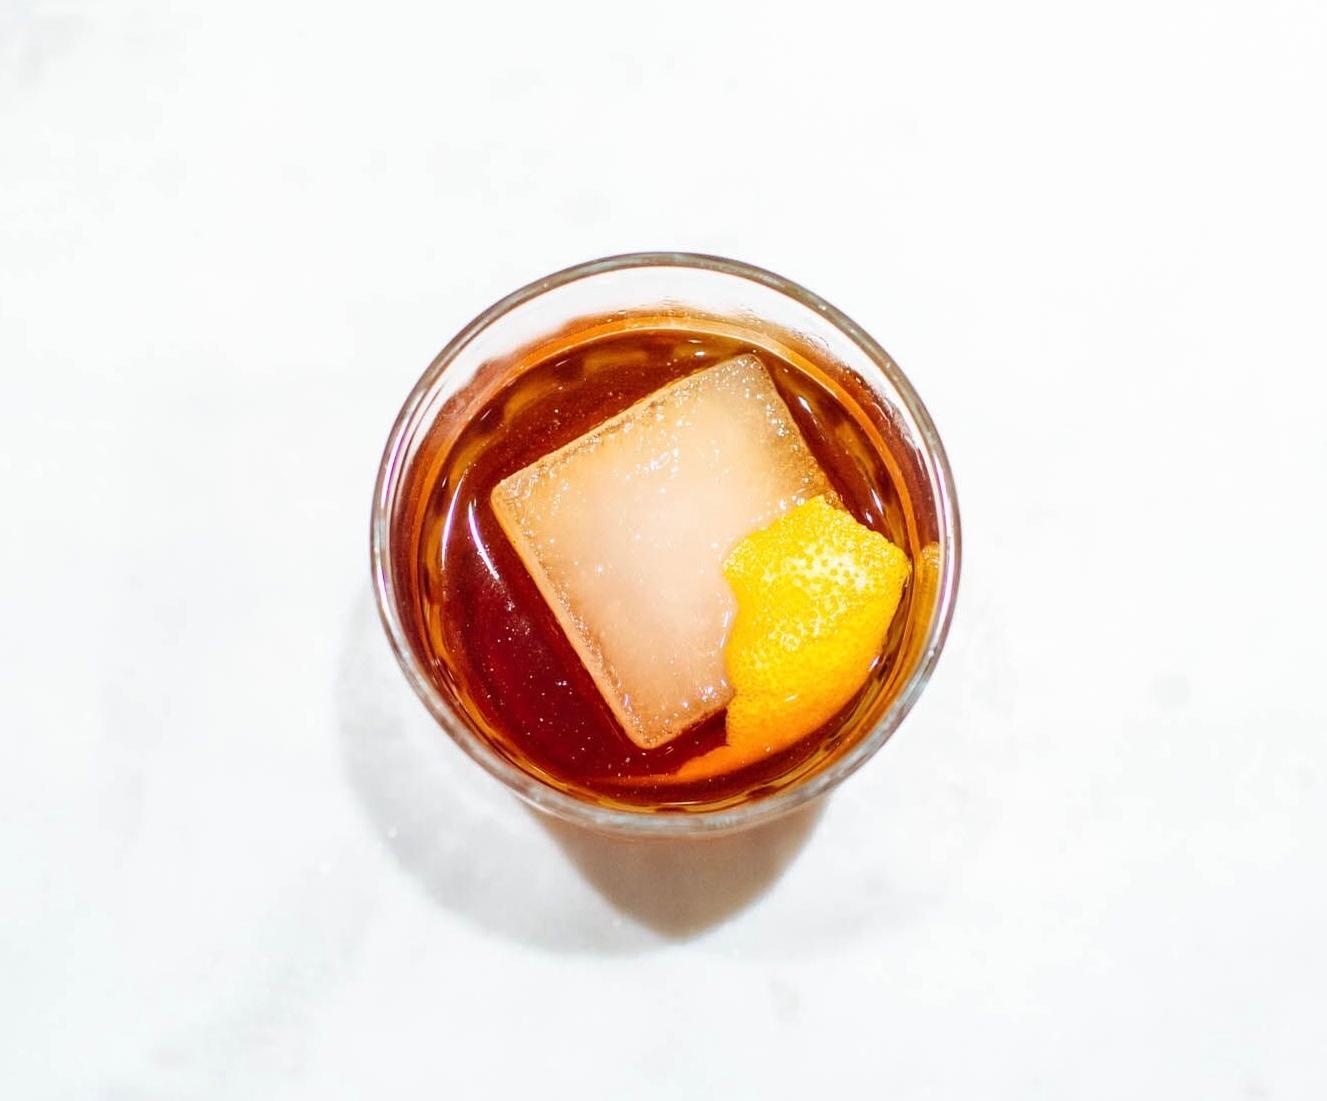 PACHUCA - 1 oz mezcal3/4 oz amargo vallet1/2 oz nostrum strawberry cascara ginger shrub1/2 oz lemon juice1/4 oz cinnamon syrupShake with ice and strain. Garnish with orange peel.